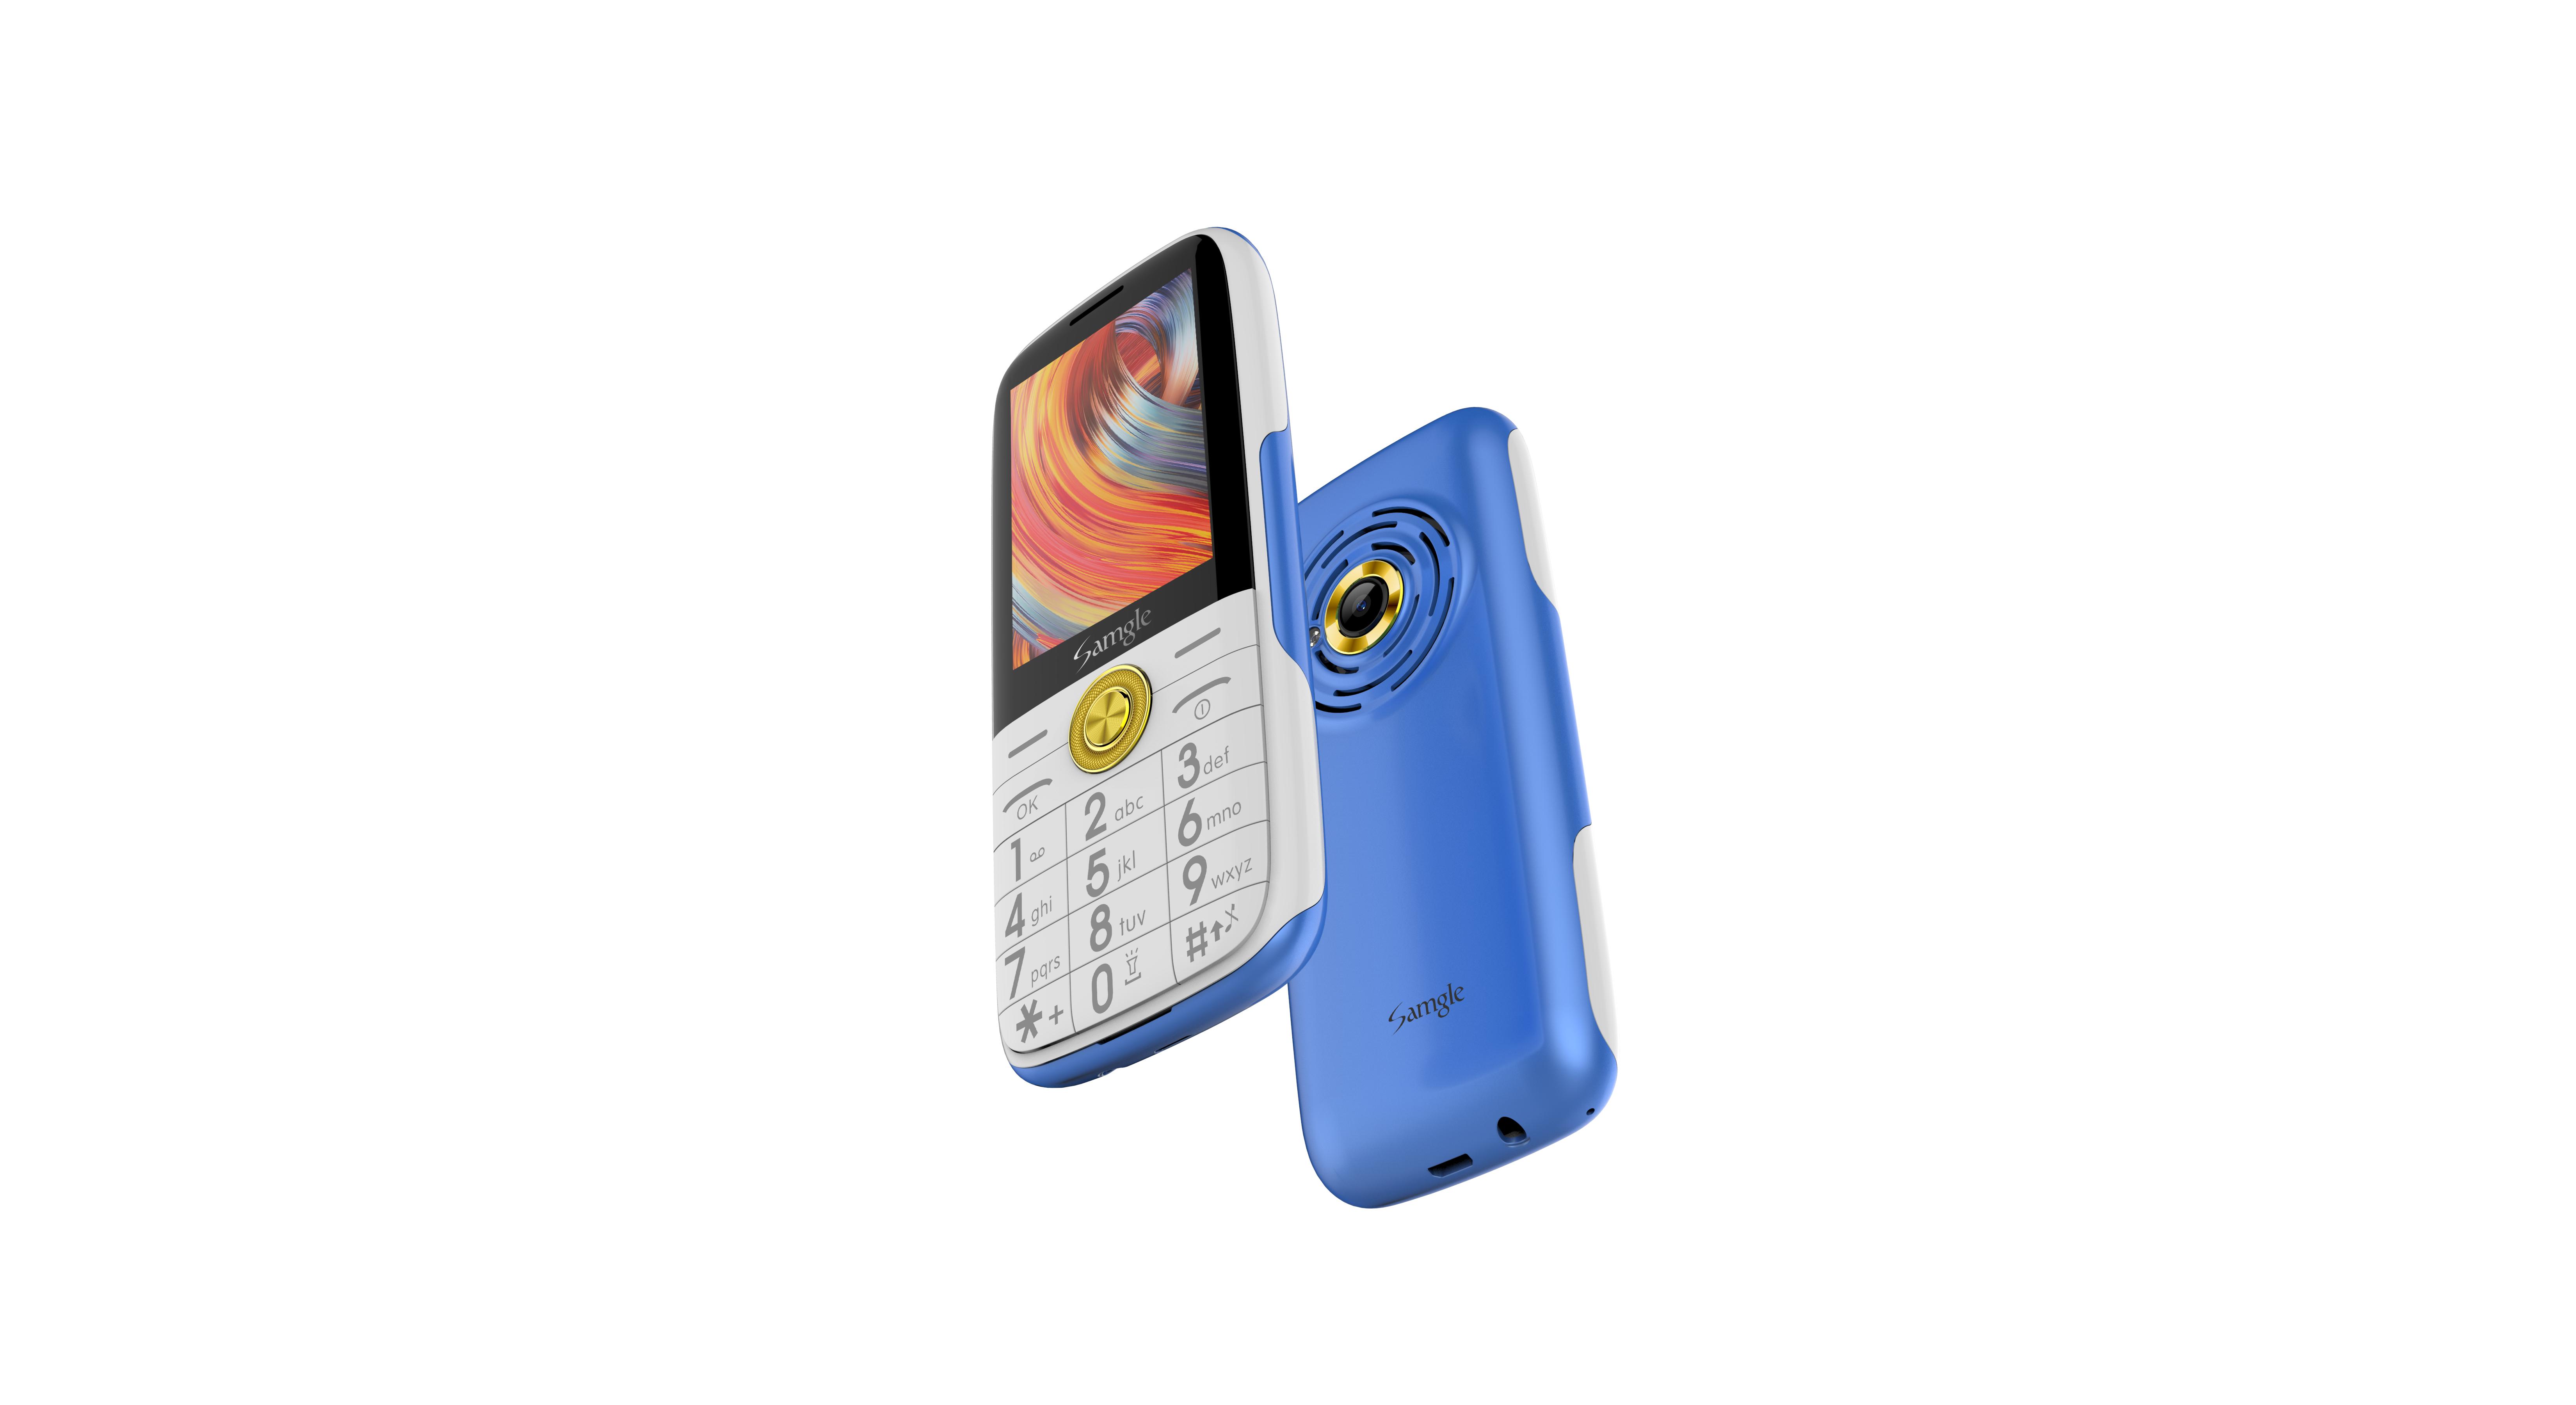 Telefon mobil Samgle Captain 3G, QVGA 2.4 inch, Bluetooth, Digi 3G, Camera, Slot Card, Radio FM, Internet, Dual SIM 16